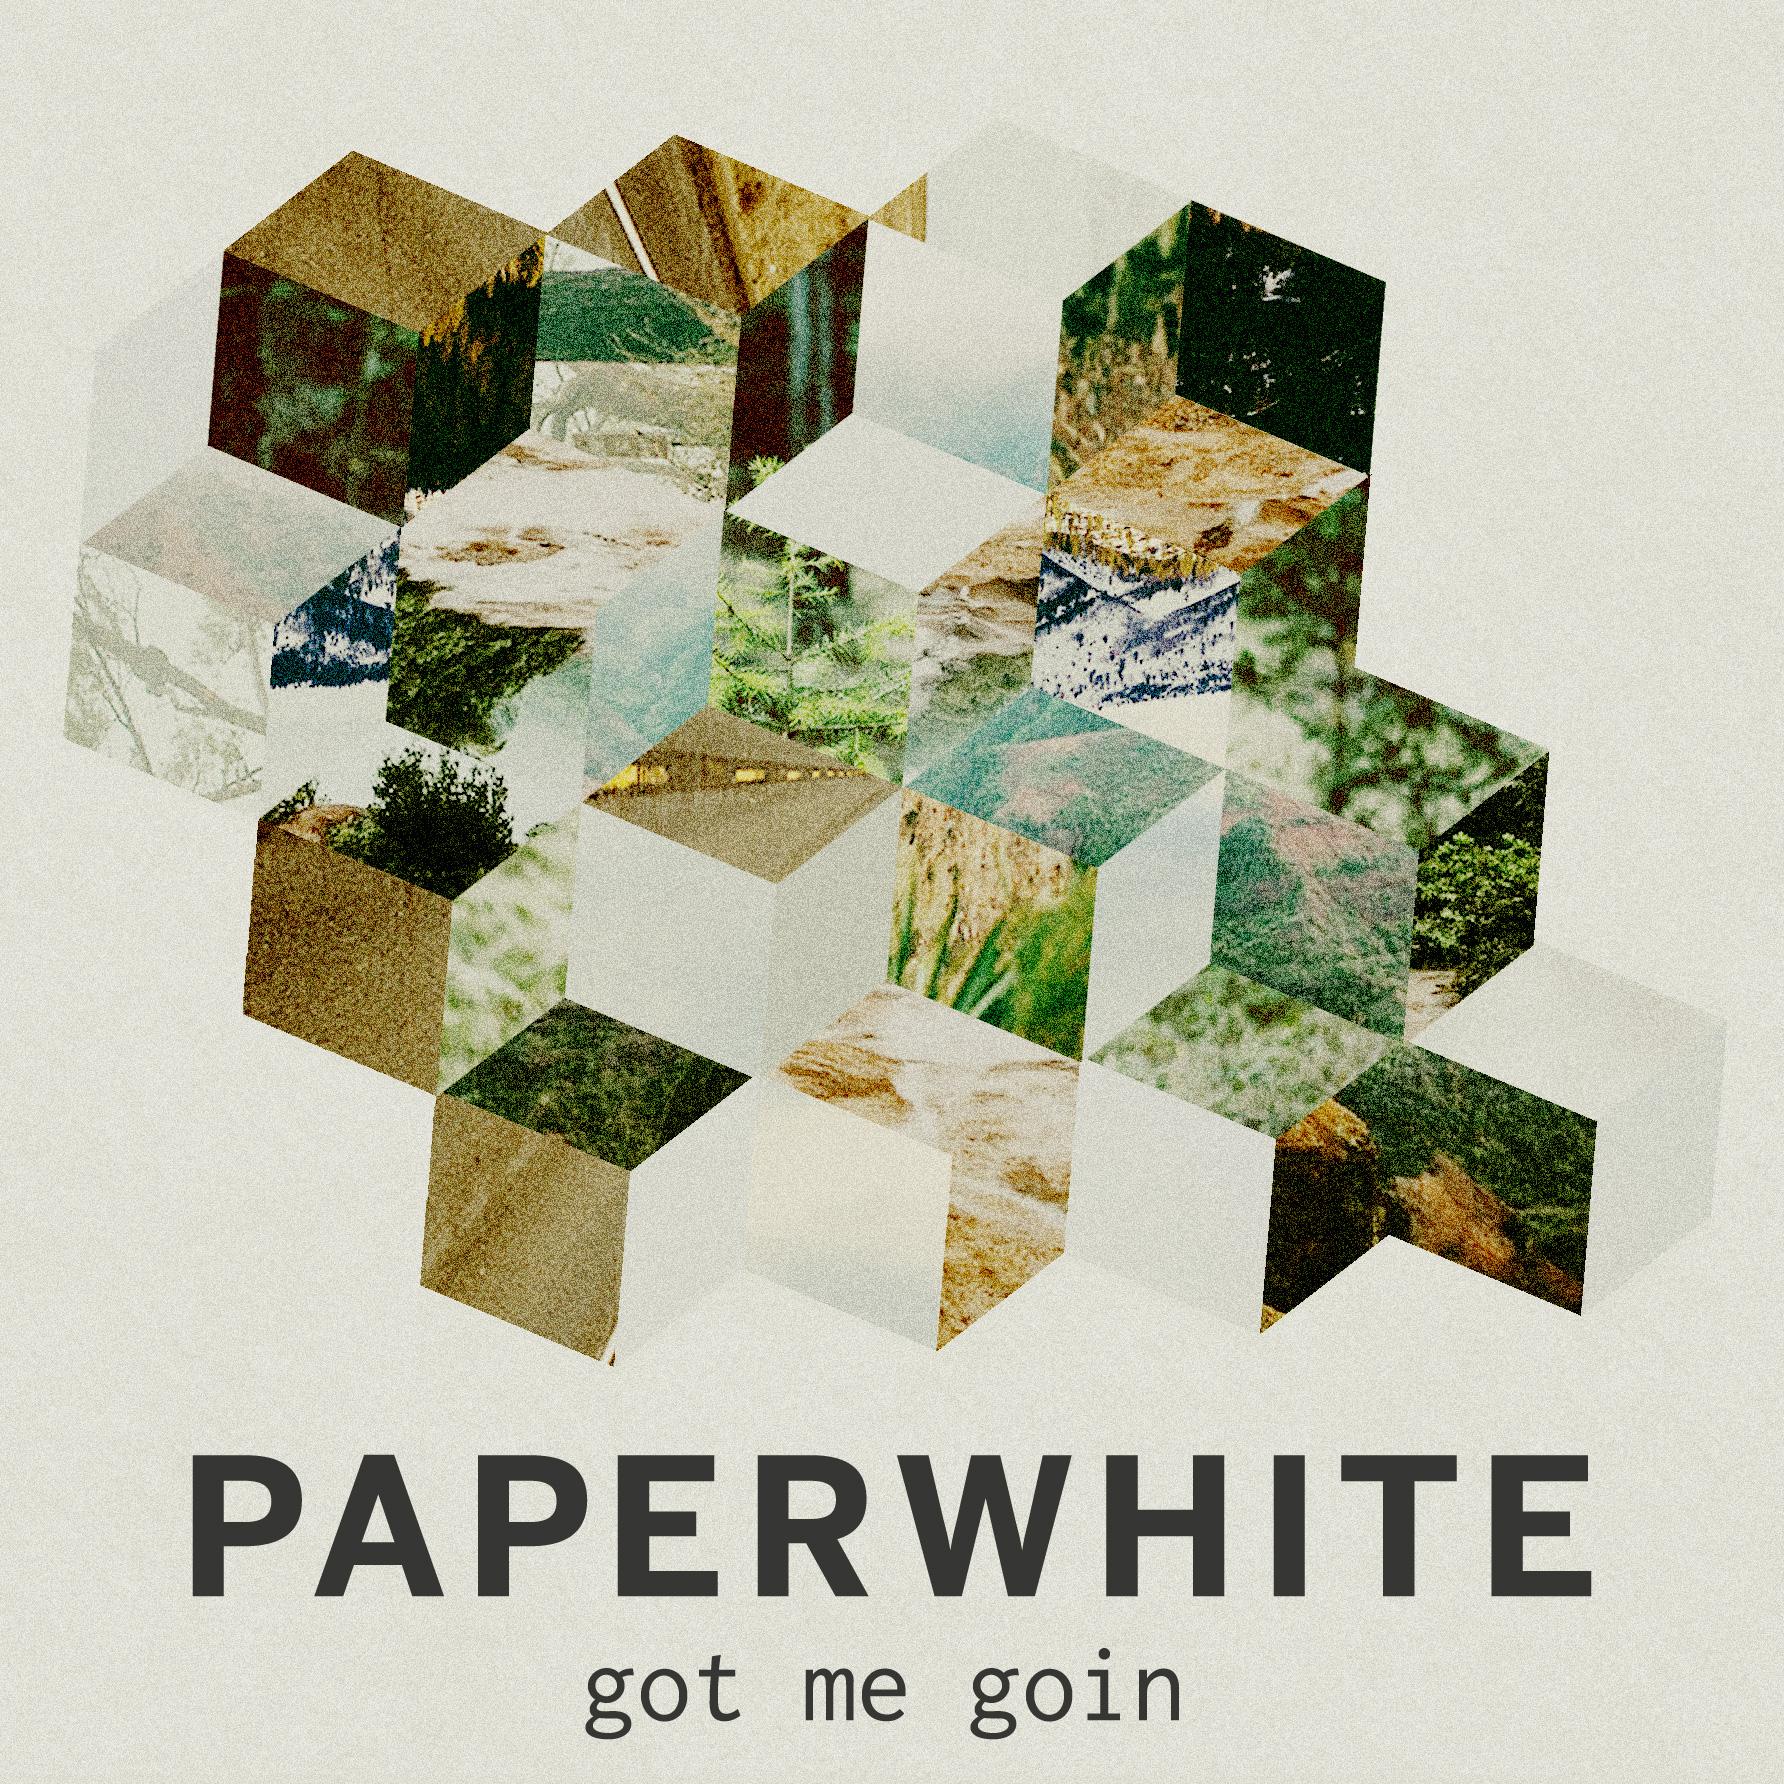 paperwhite_gotmegoin-gray.jpg